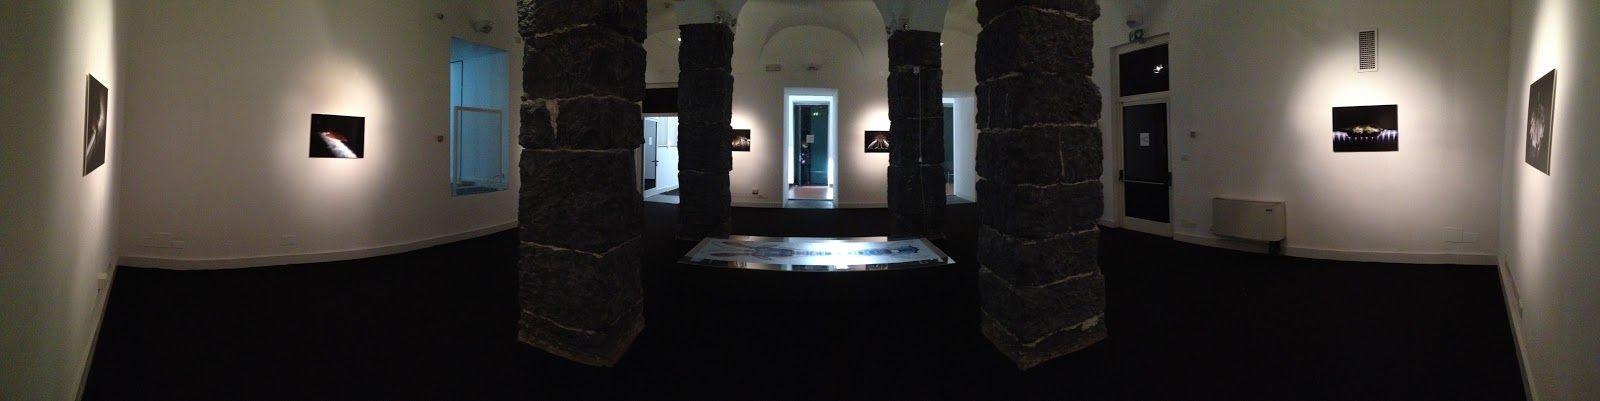 MAURO PANICHELLA - LIGHT FLOW THRESHOLD Sala Dogana / Palazzo Ducale Genova  #mauropanichella #panichella #art #scannerart #contemporaryart #installationart #scannography #digitalart